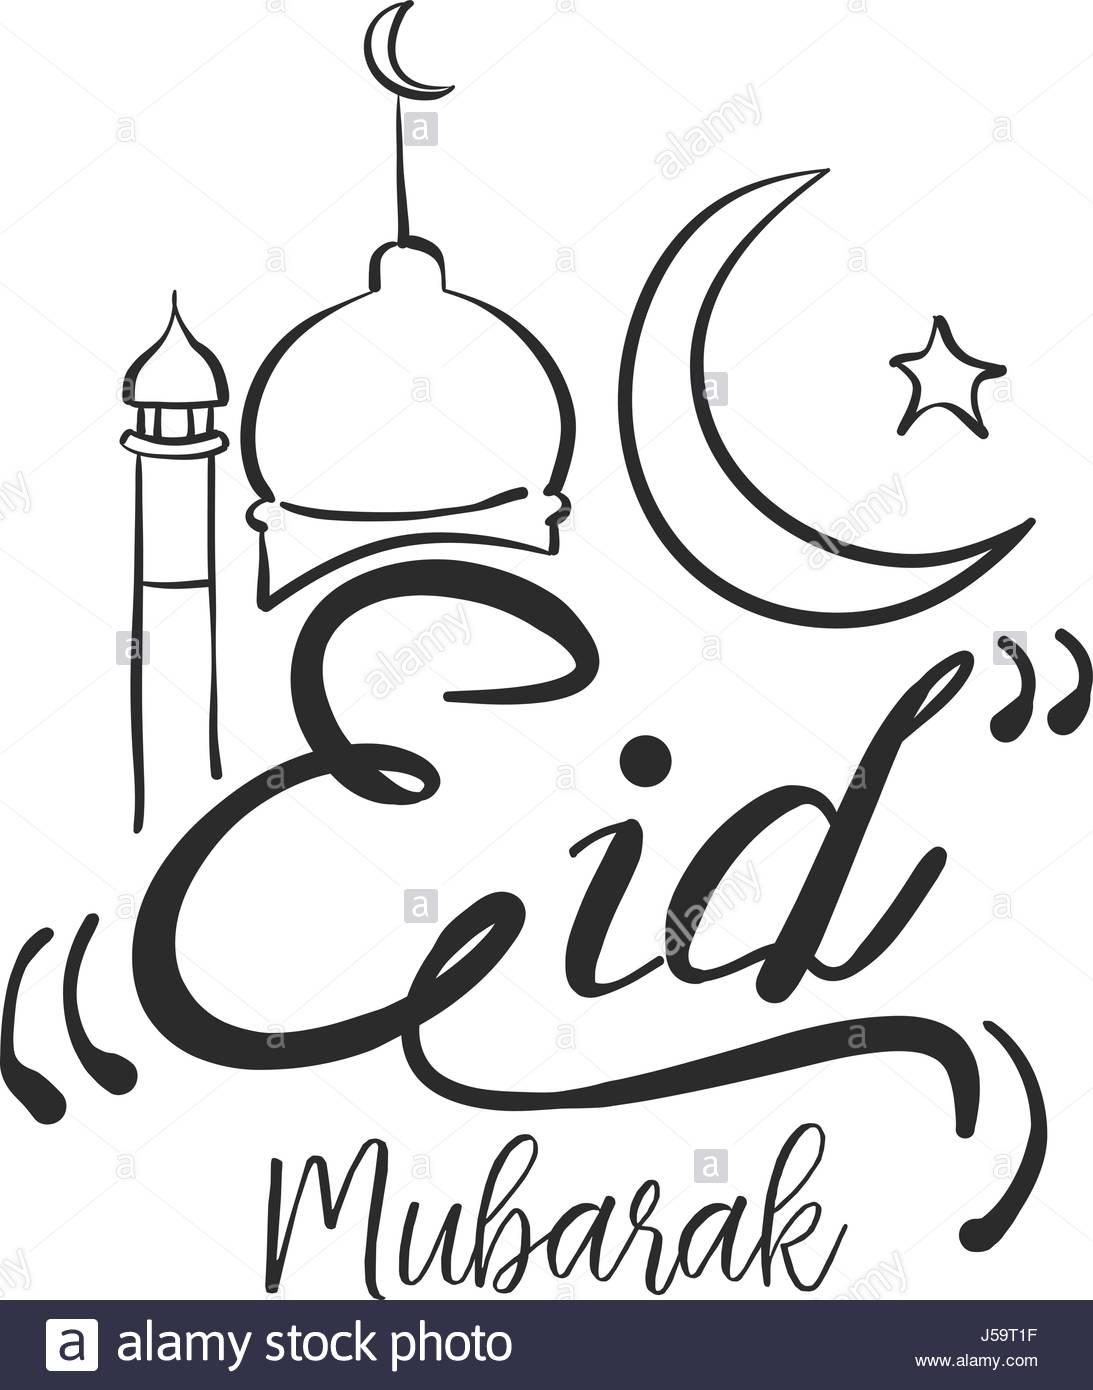 Eid mubarak images clipart graphic library Eid mubarak clipart 9 » Clipart Station graphic library